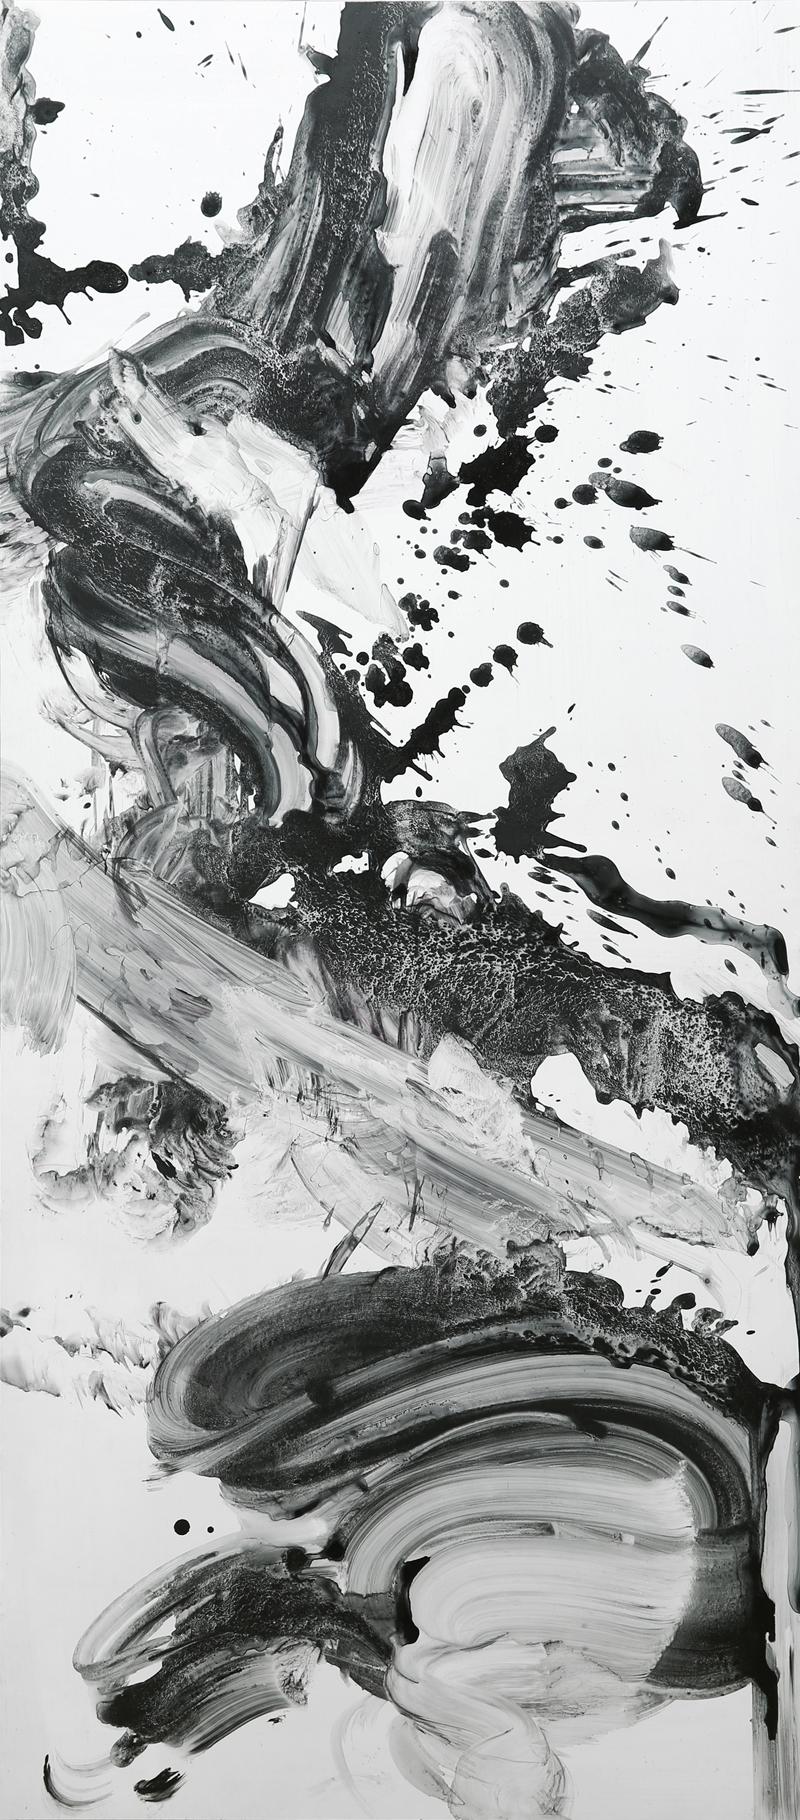 Untitled 04, 2014